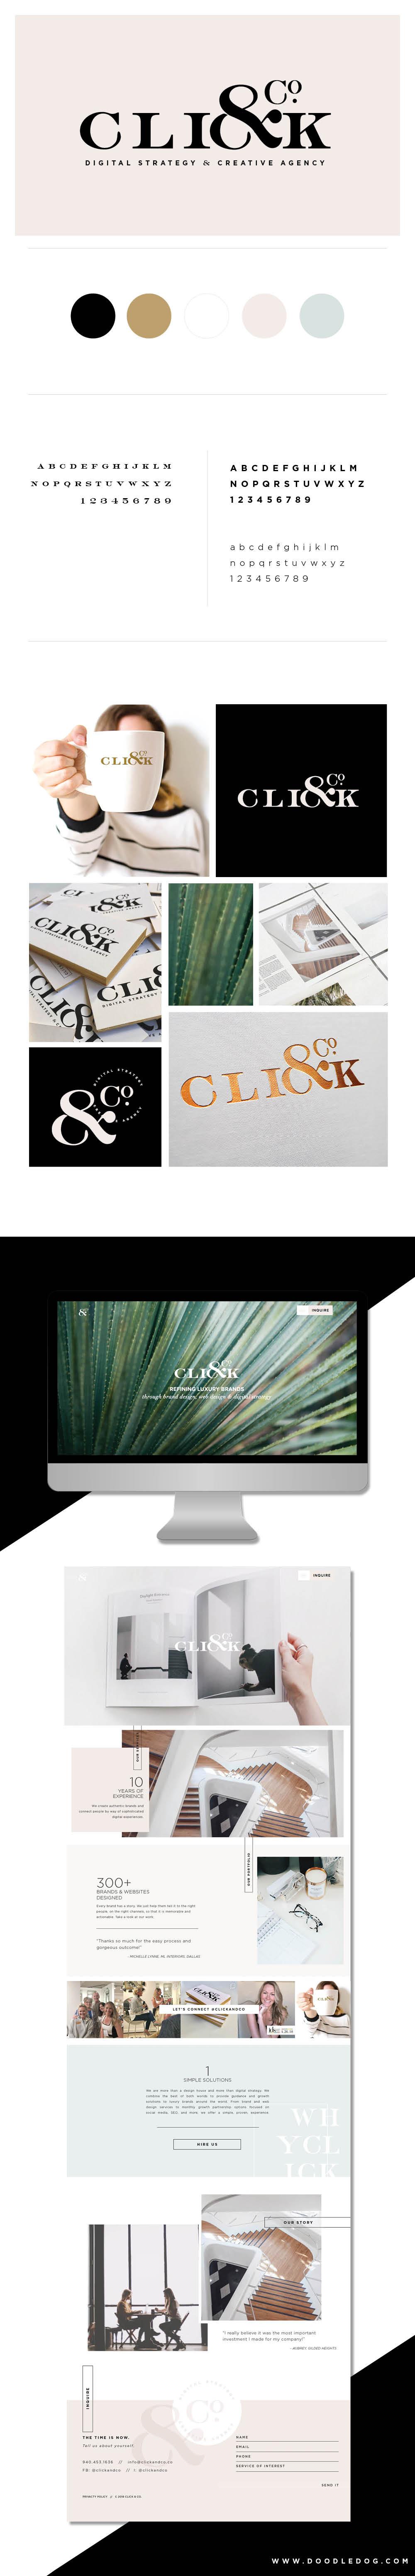 Luxury web design agency dallas, creative agency, digital agency, dallas, texas